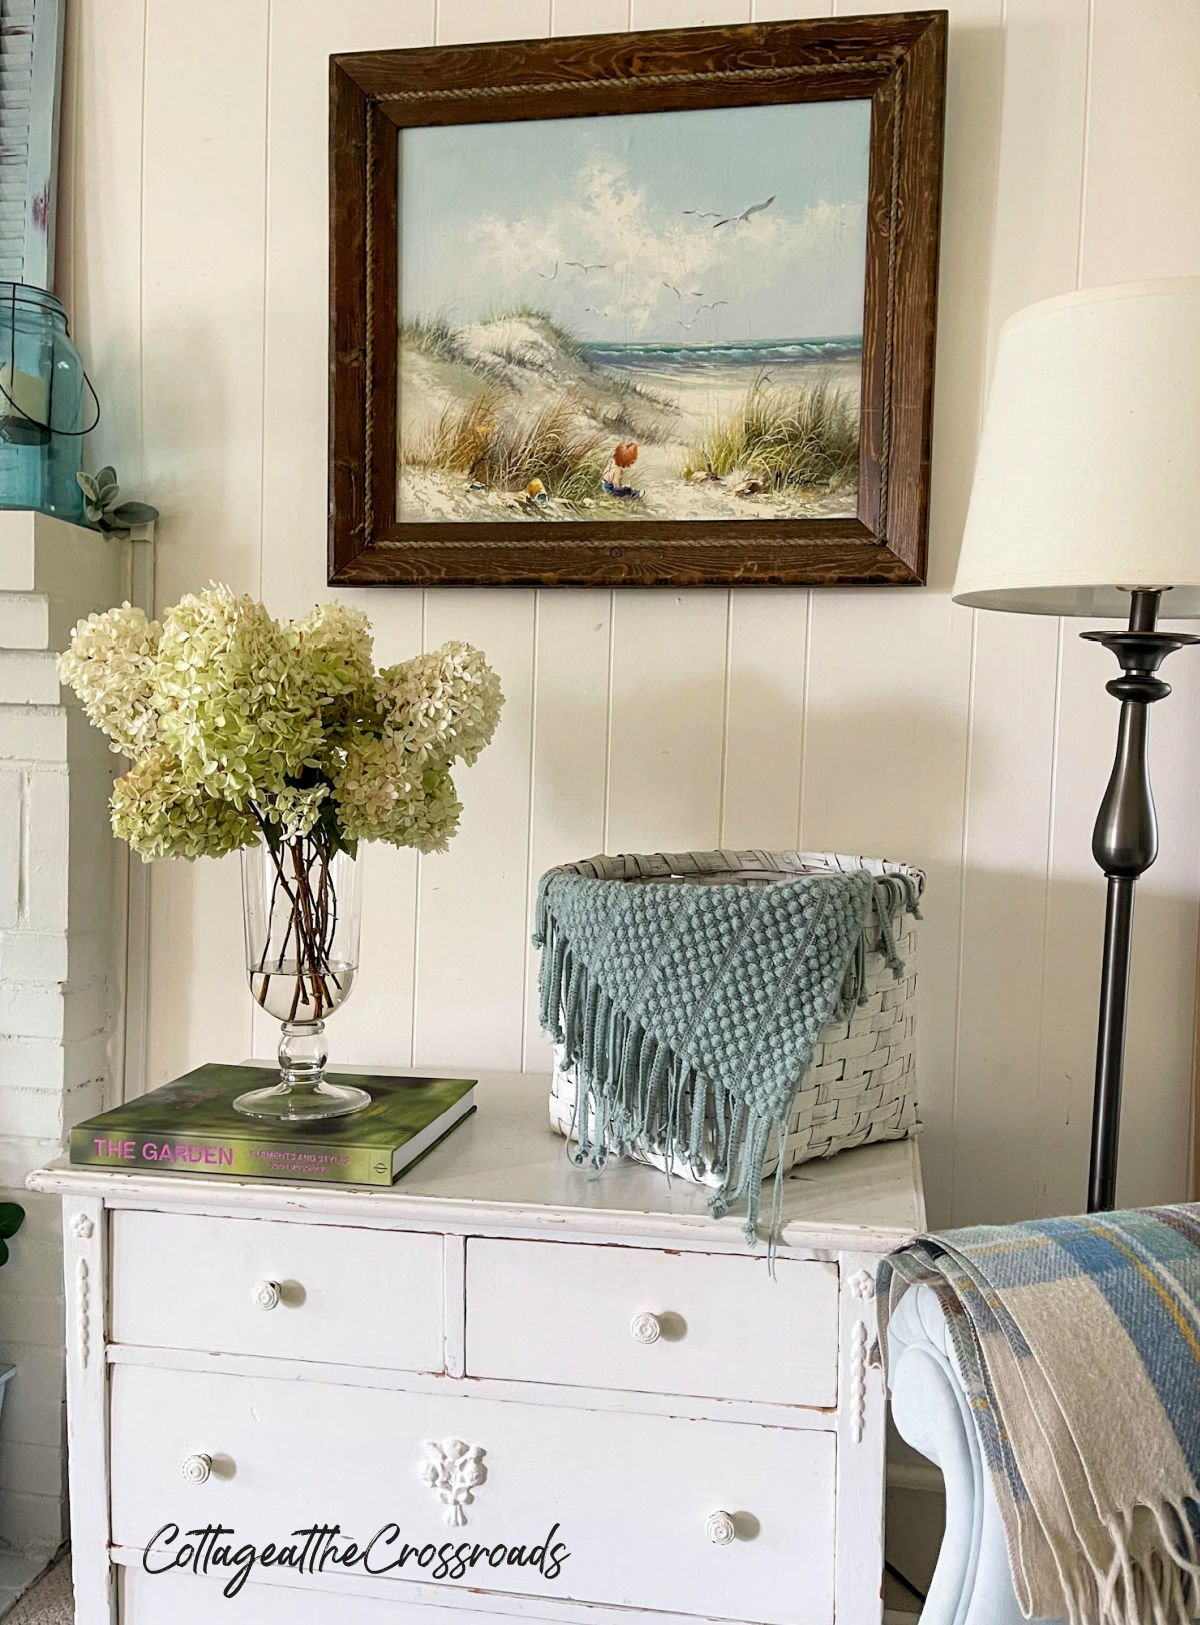 limelight hydrangeas in a vase